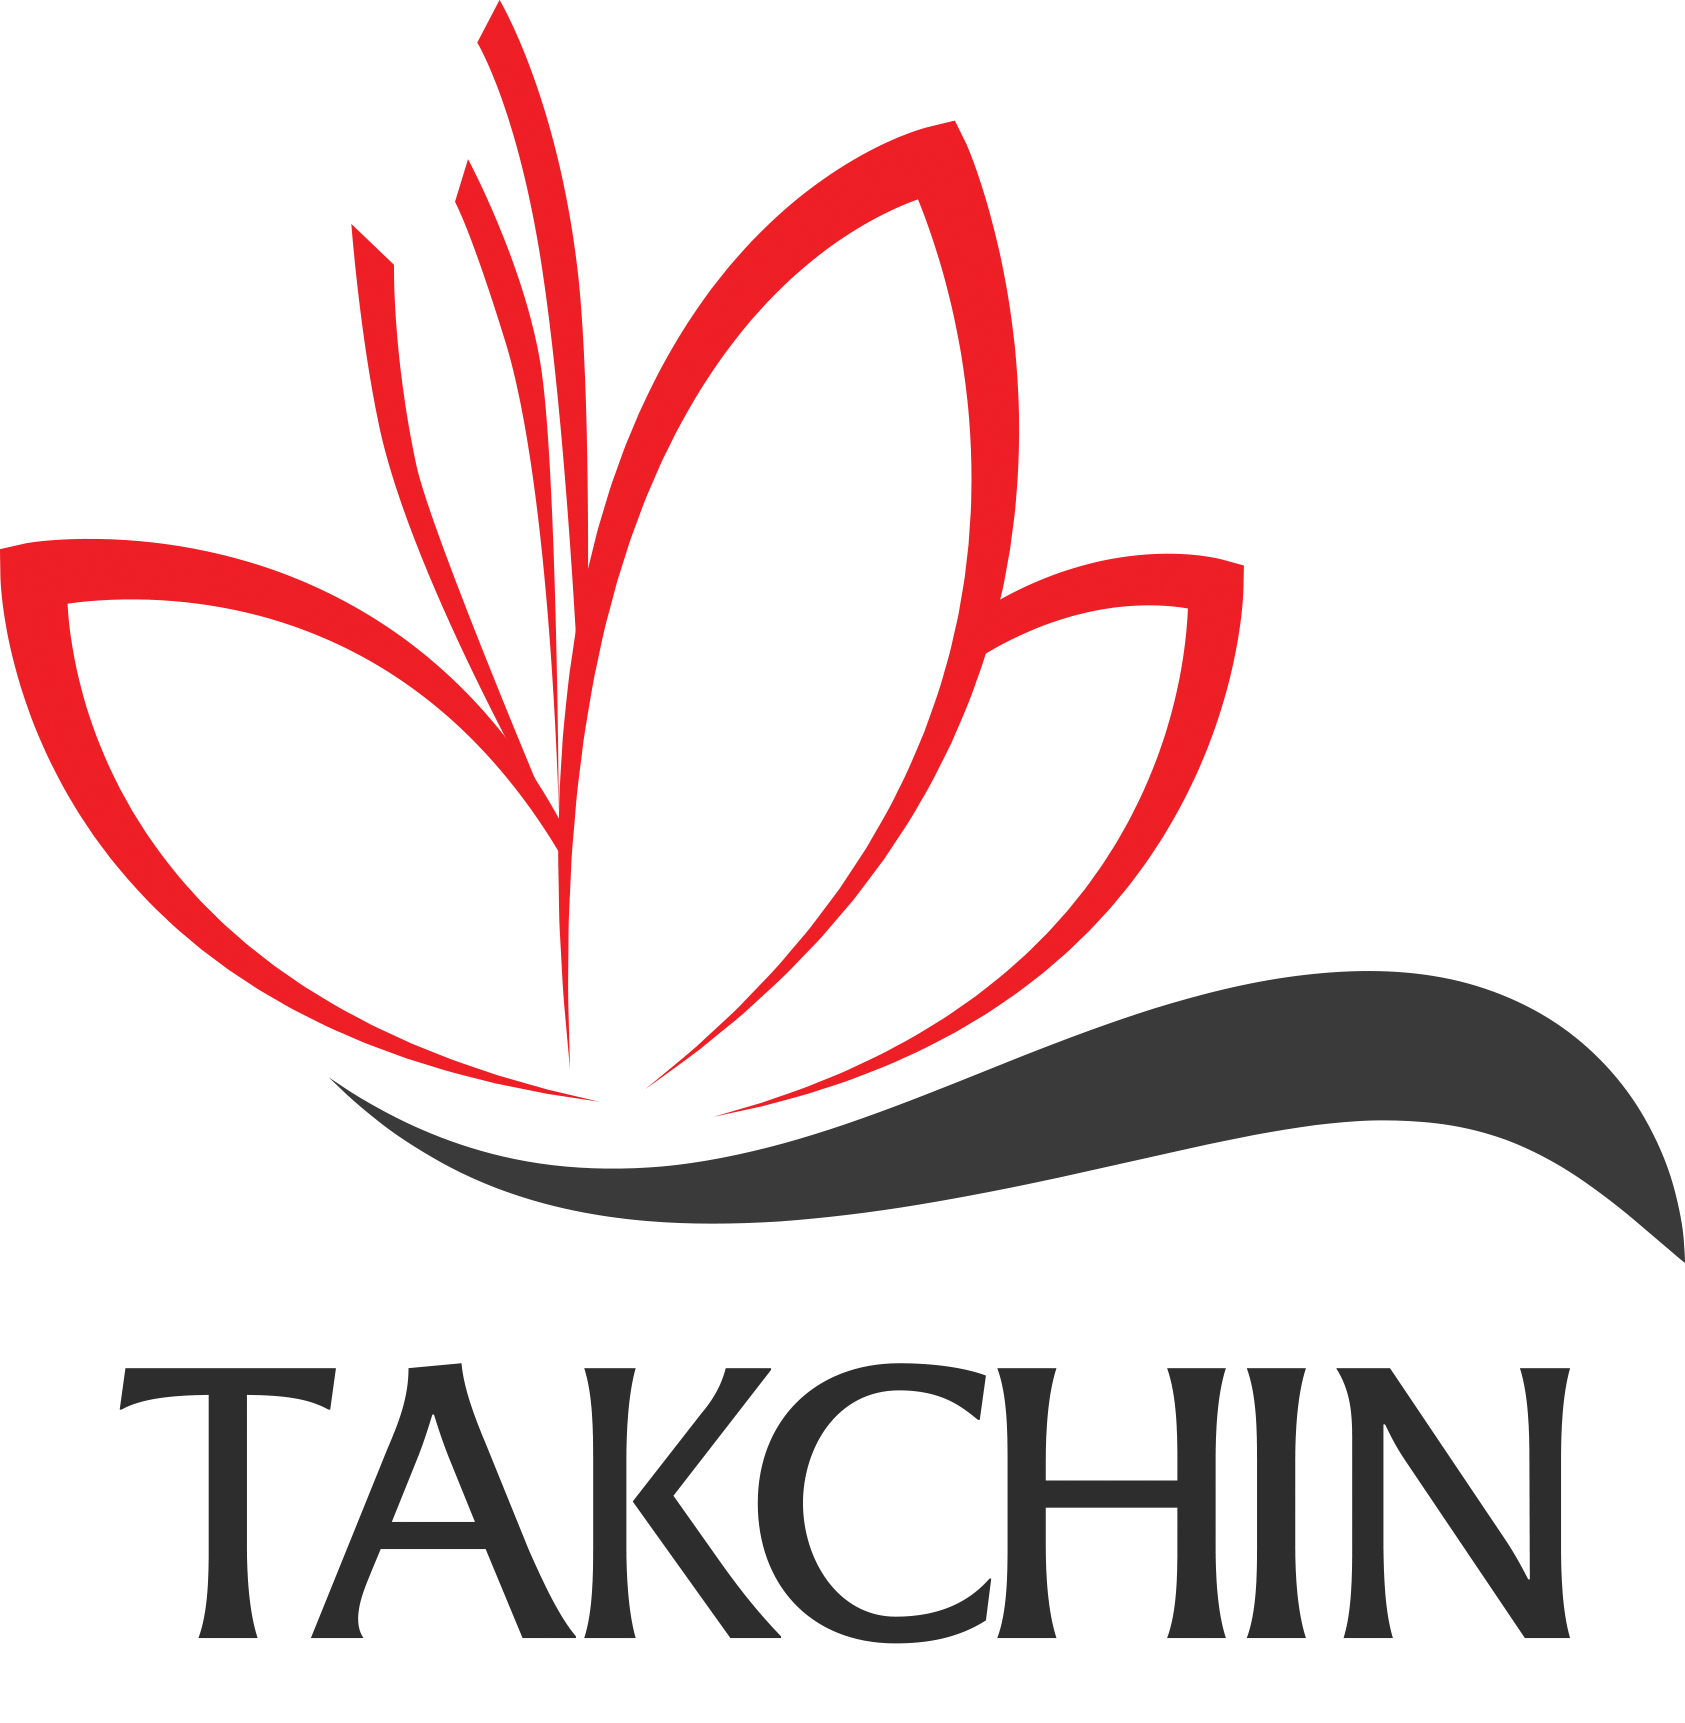 Takchin